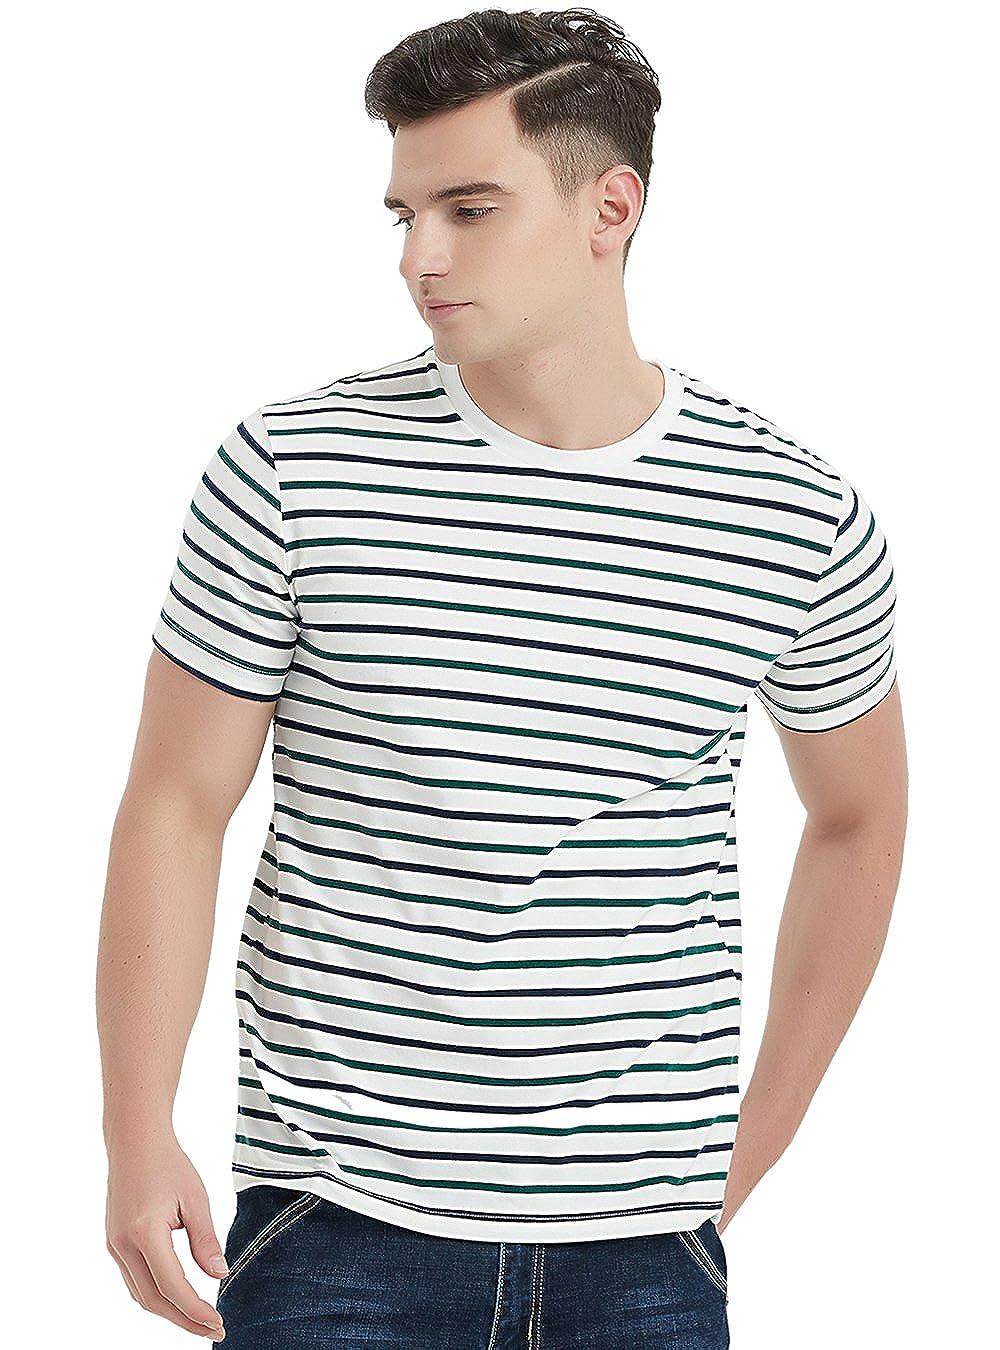 Navy & Green Stripes